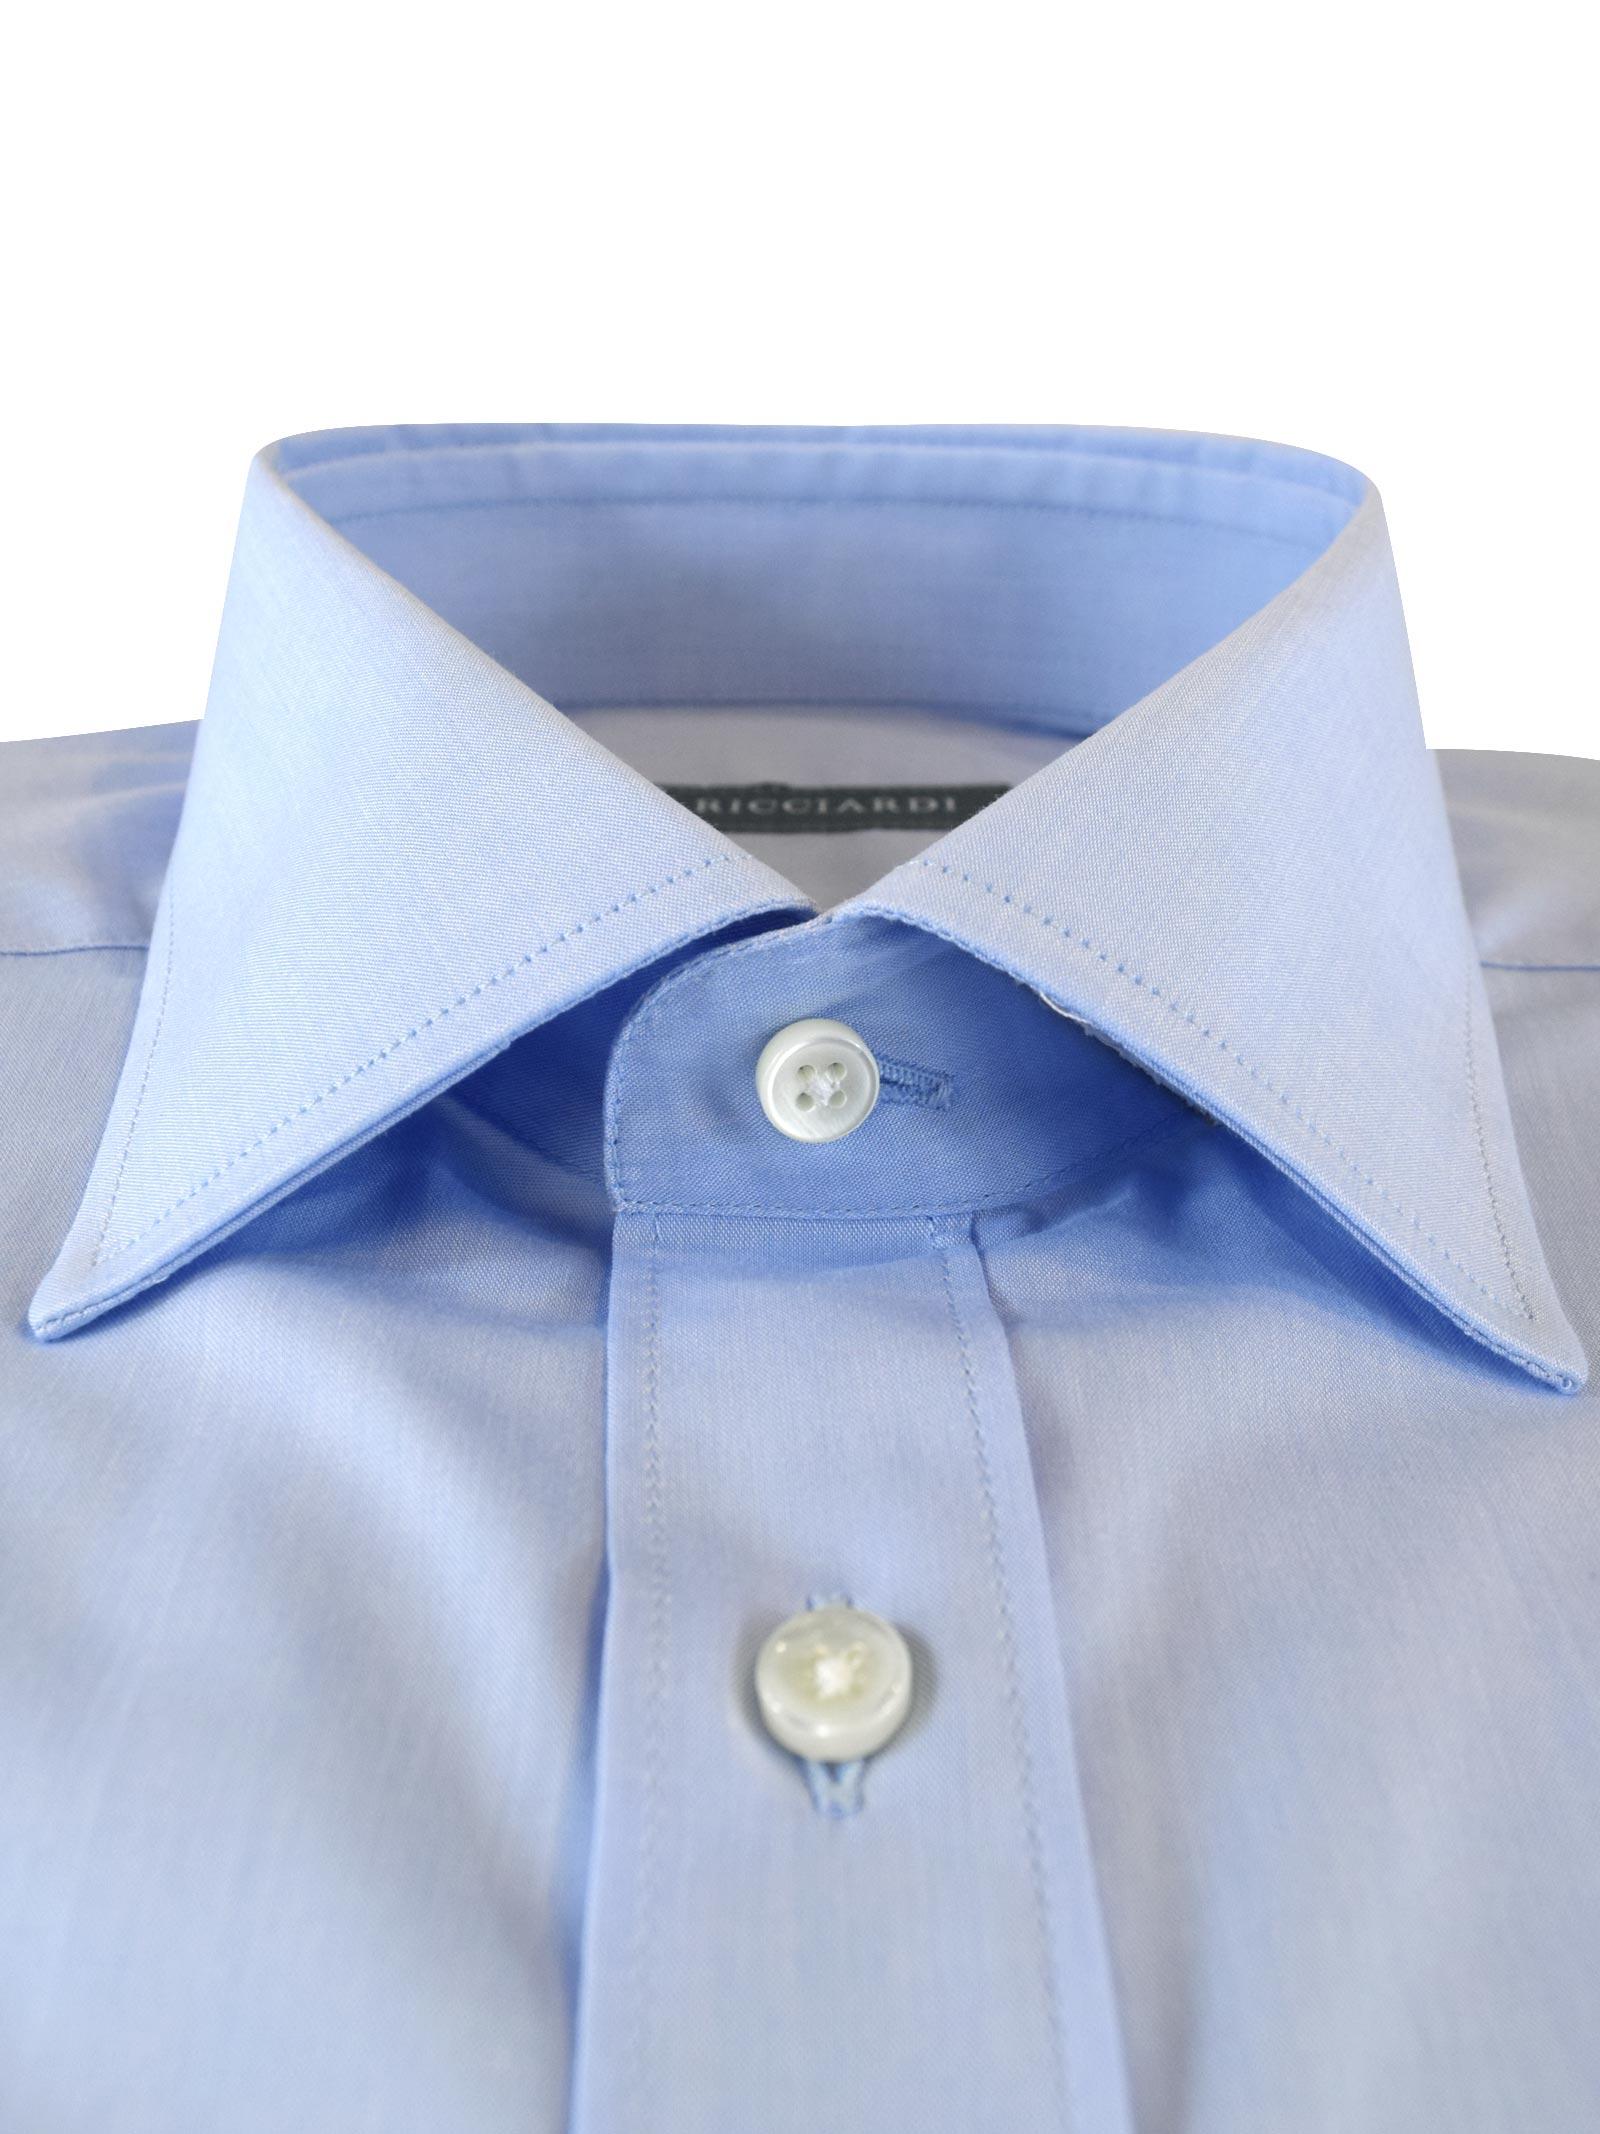 RICCIARDI   Shirts   ADAMO2115